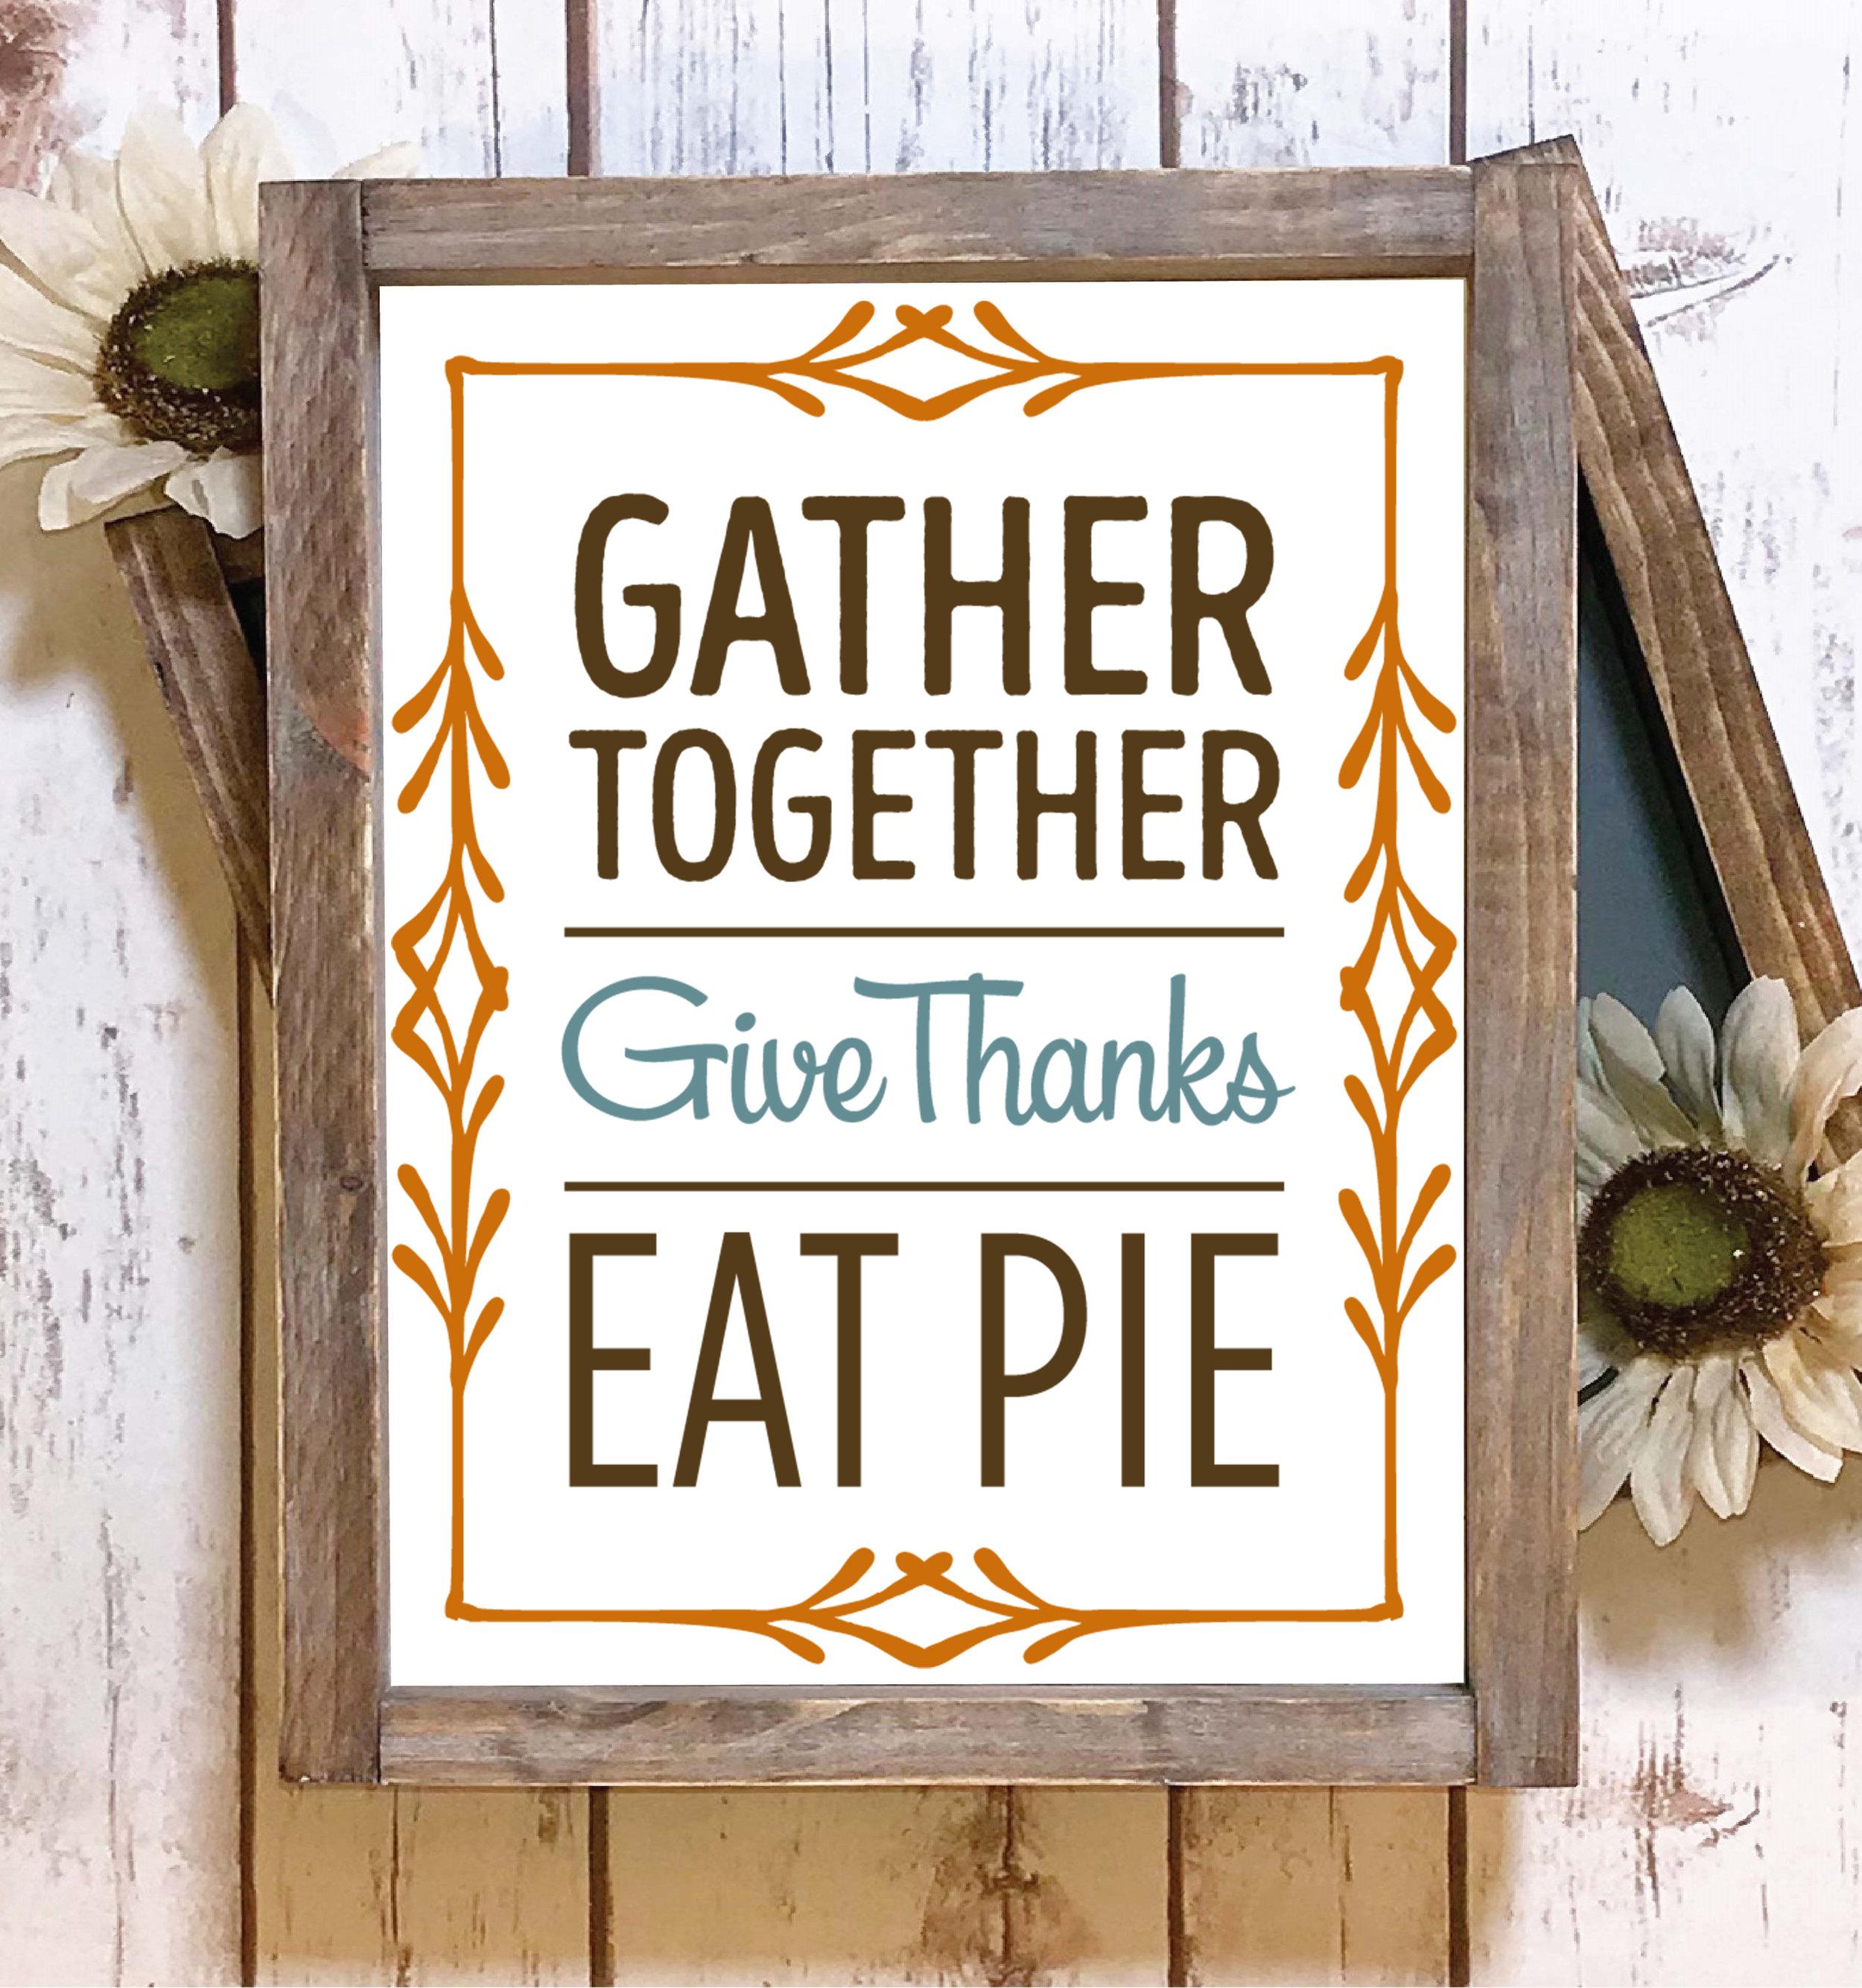 Gather Together Eat Pie.jpg